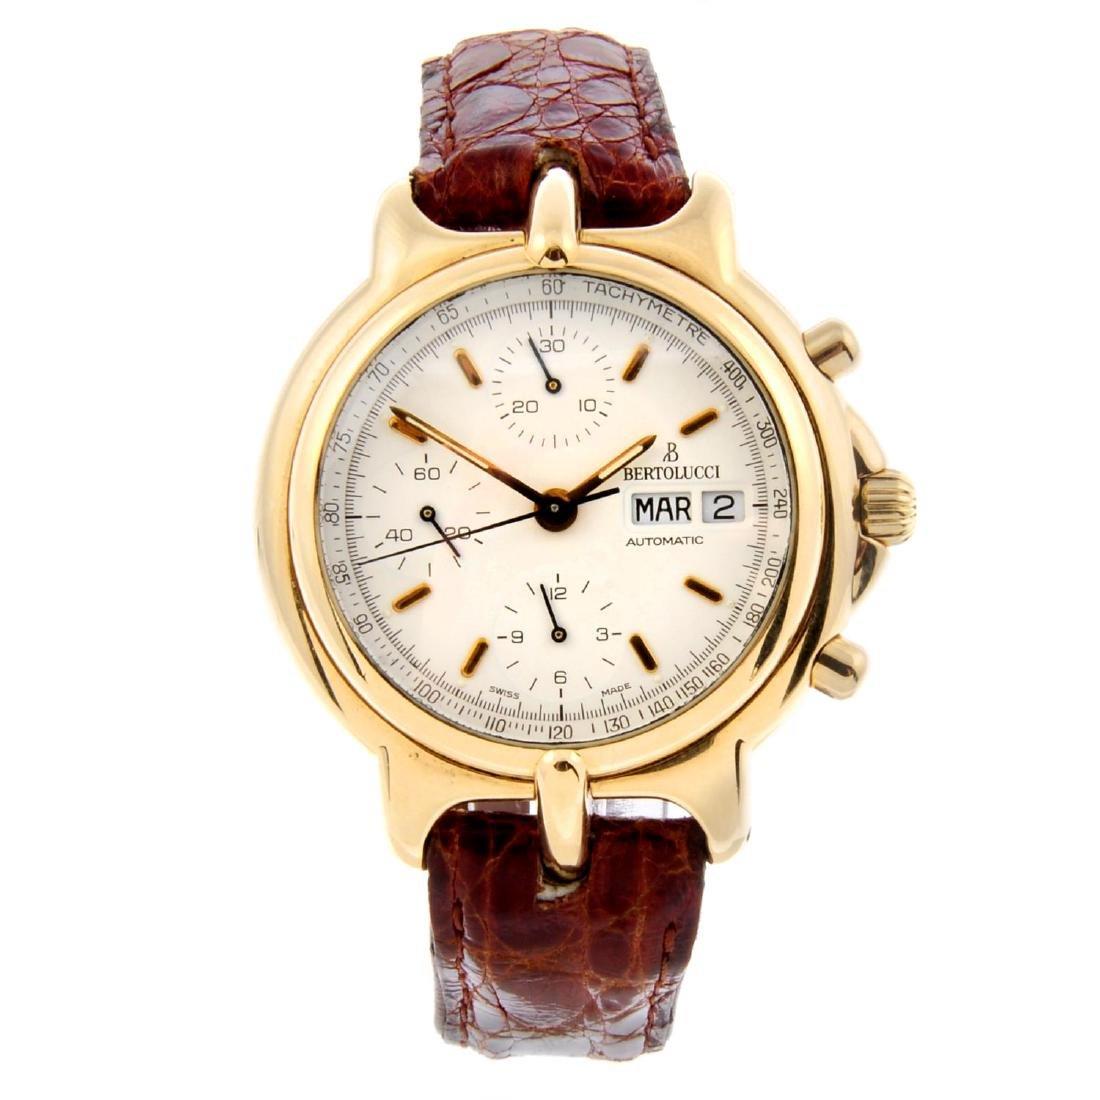 BERTOLUCCI - a gentleman's Pulchra chronograph wrist